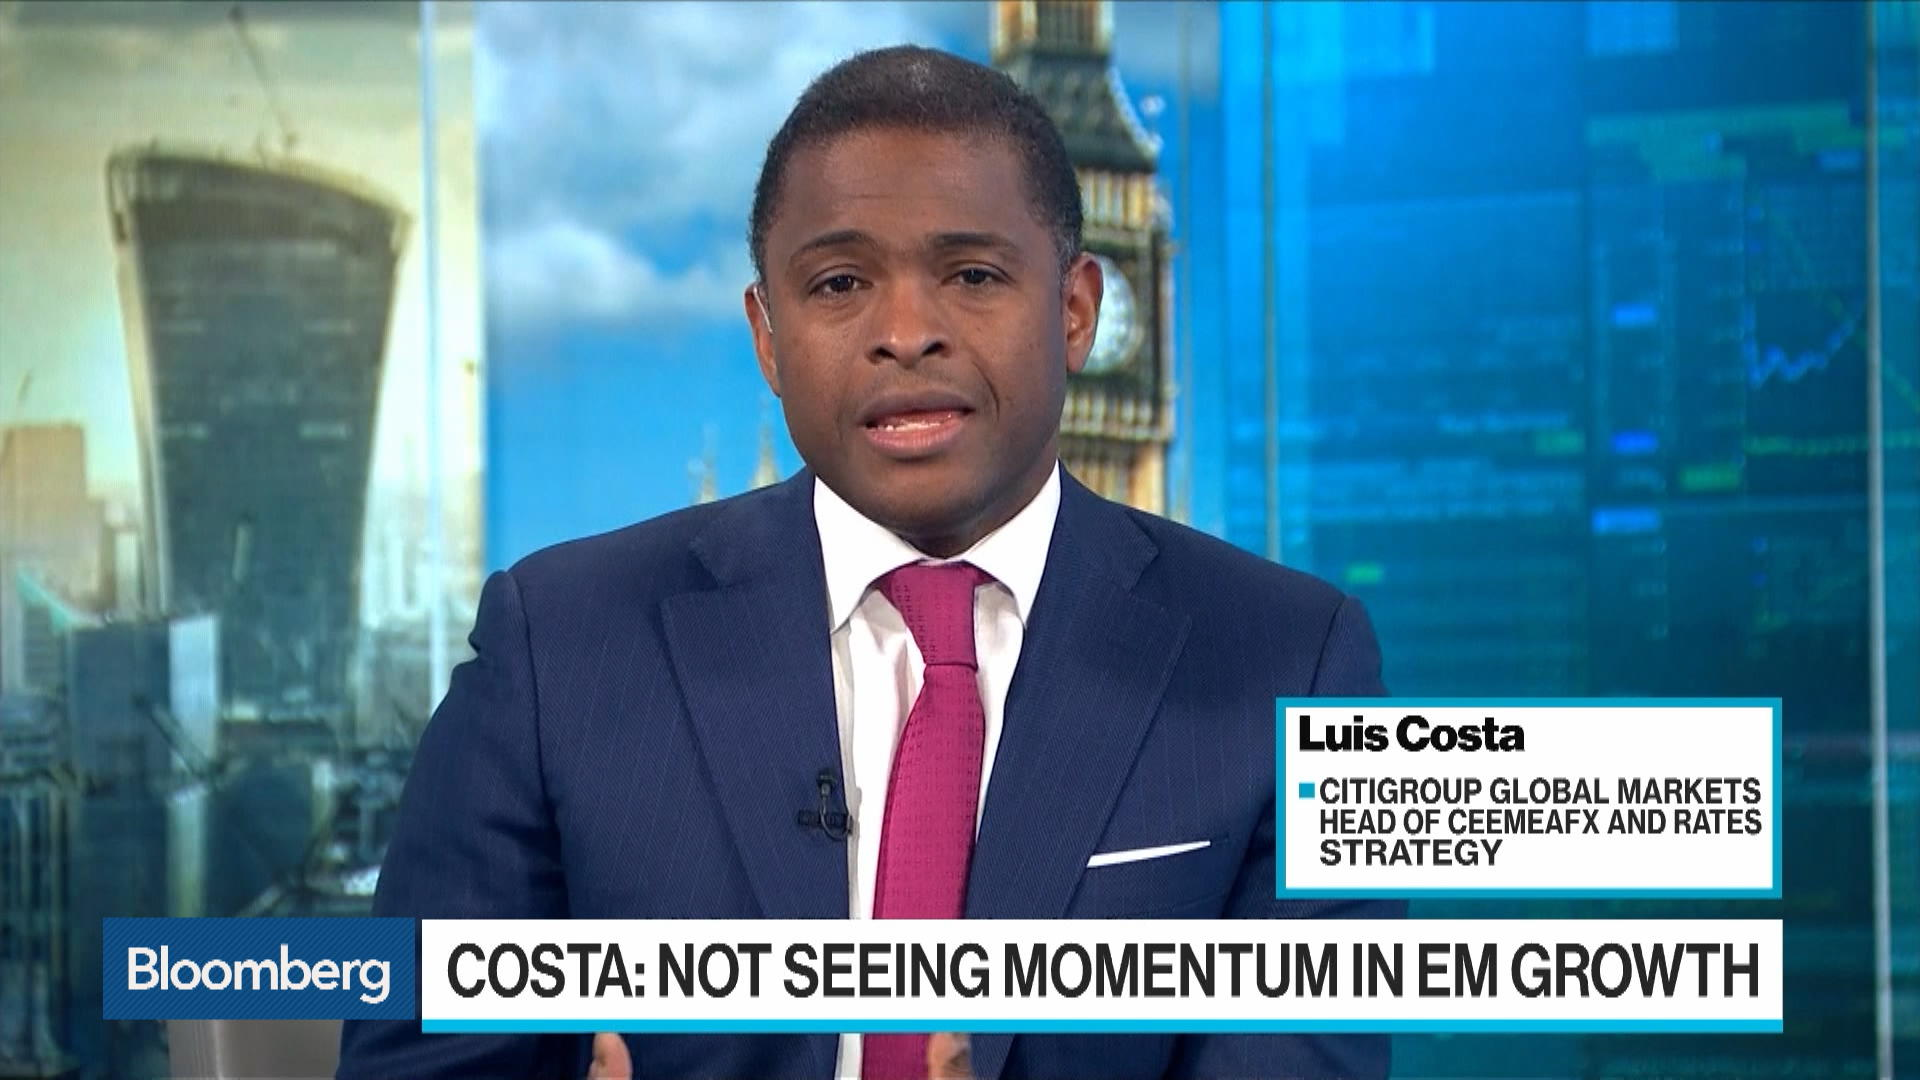 China Stimulus Not Having an Impact Across EM, Citi's Costa Says